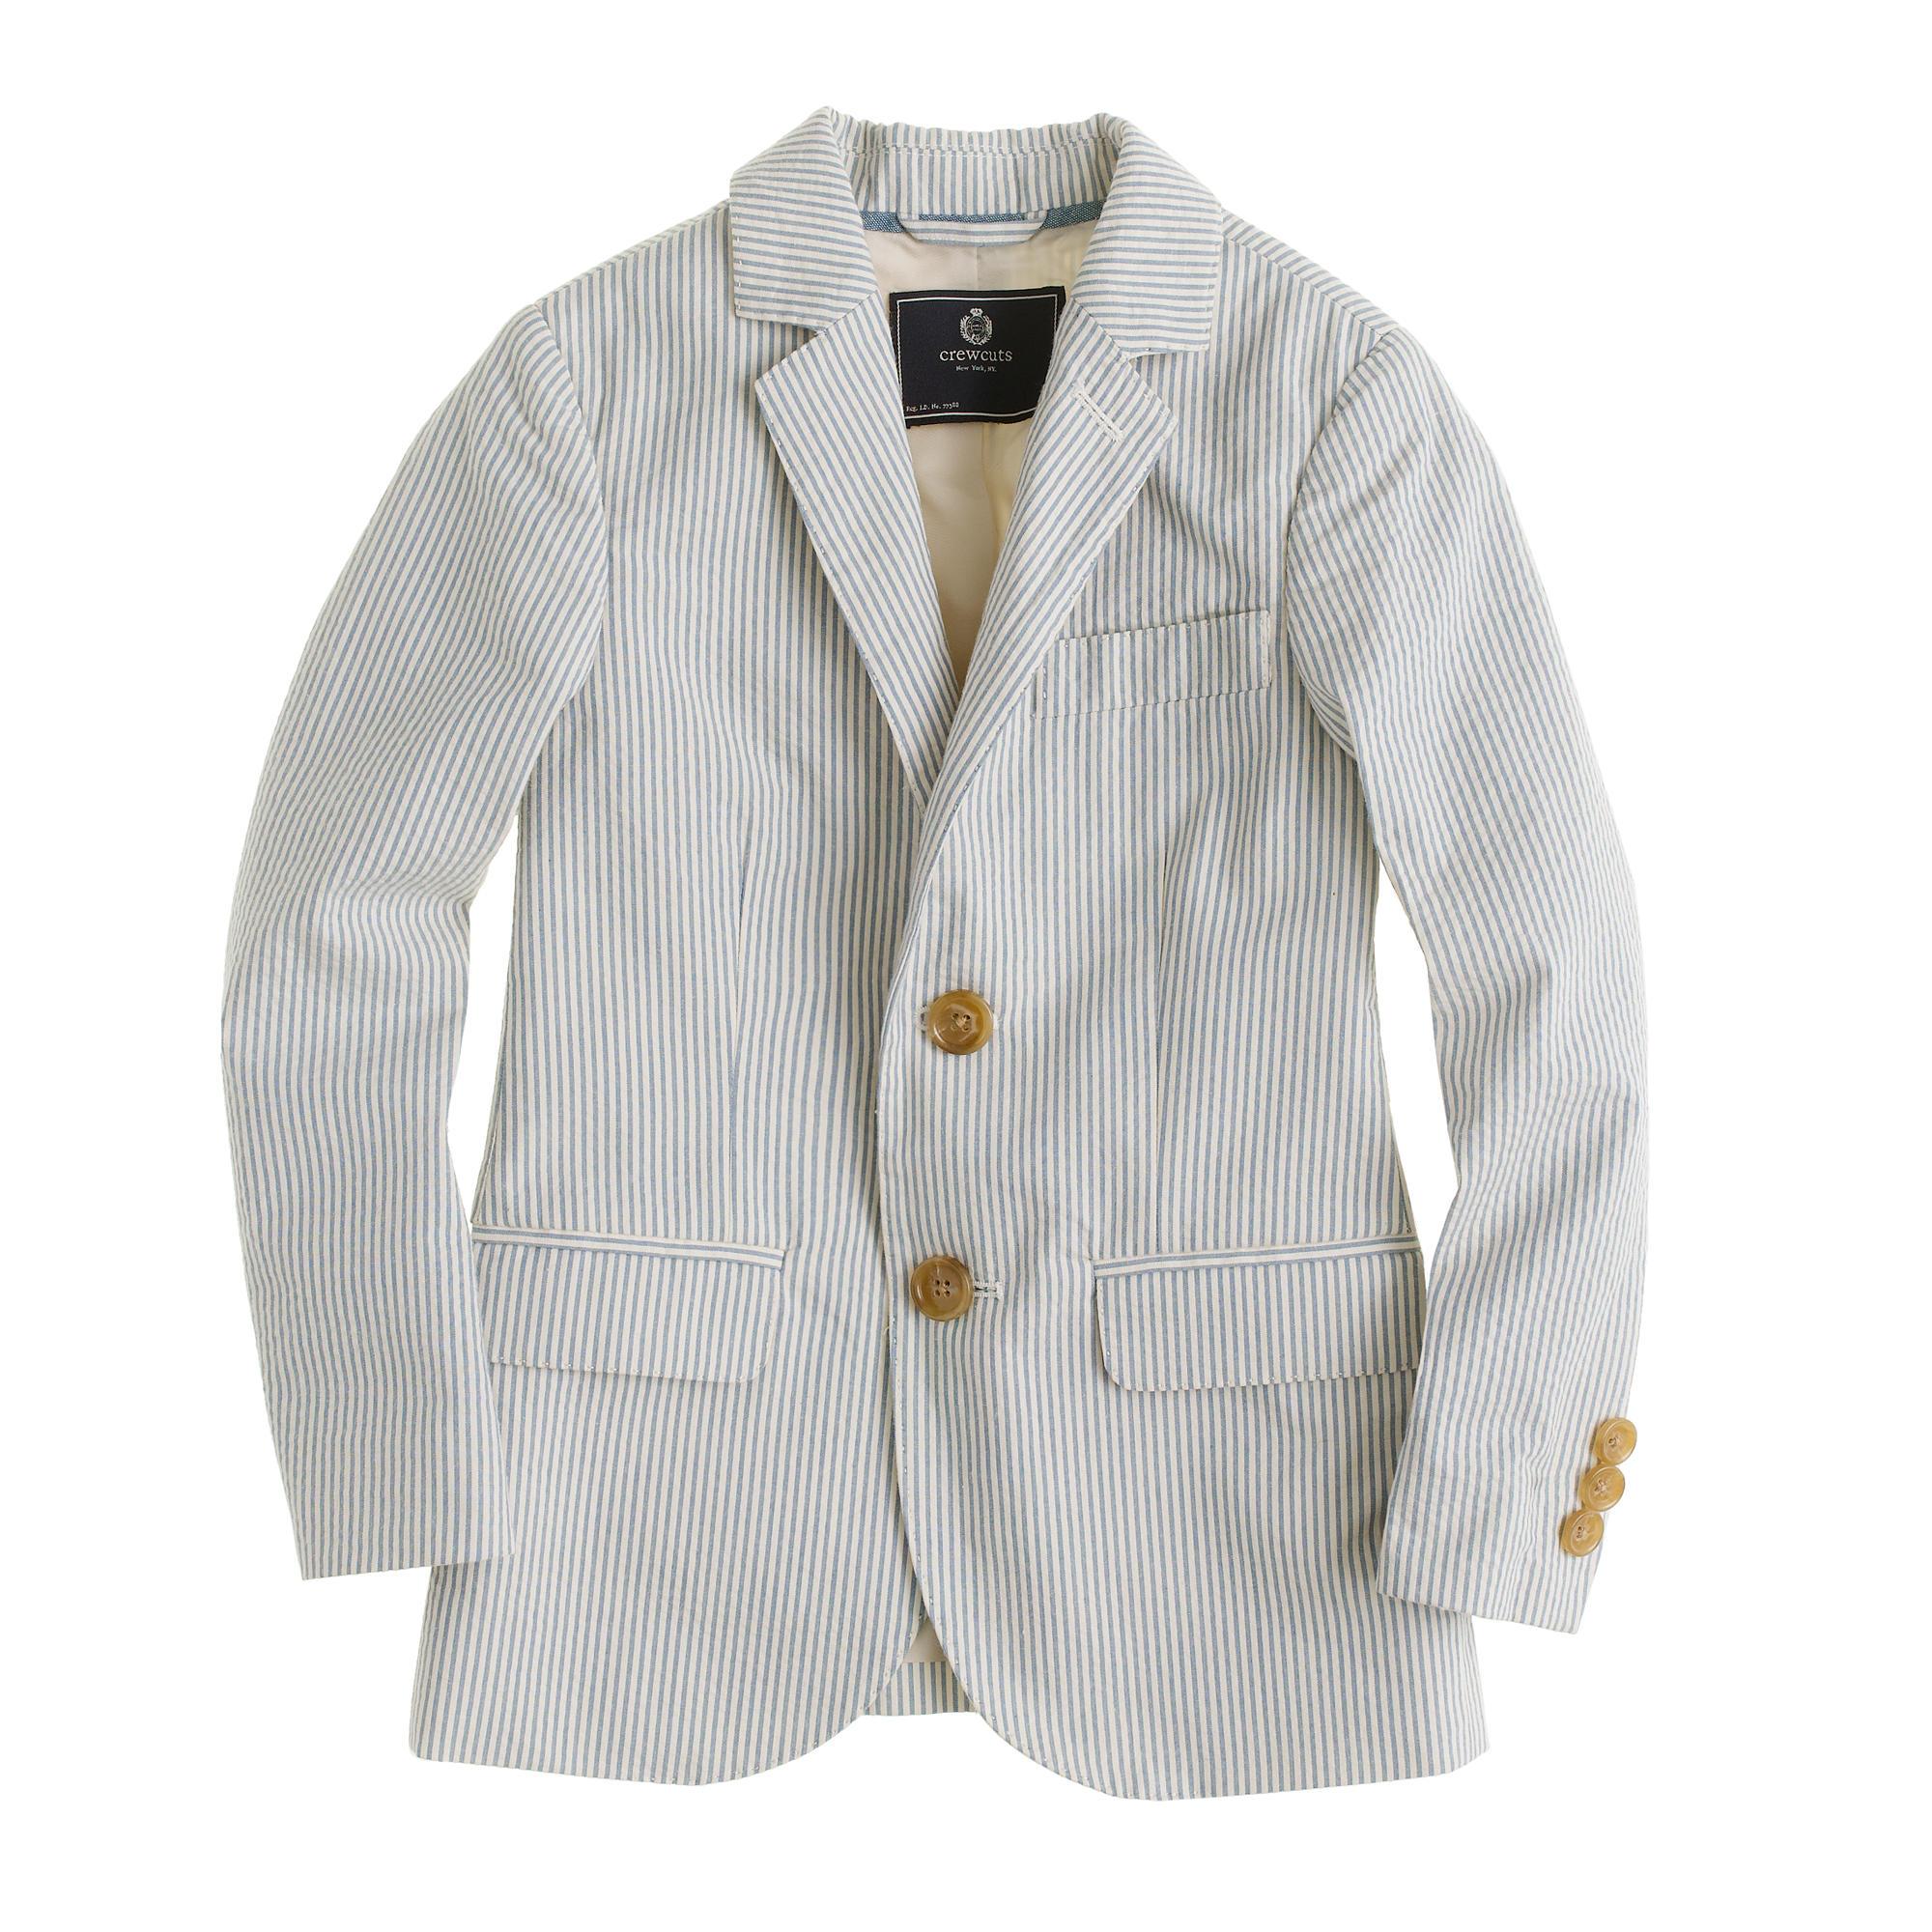 Find great deals on eBay for boys seersucker blazer. Shop with confidence.